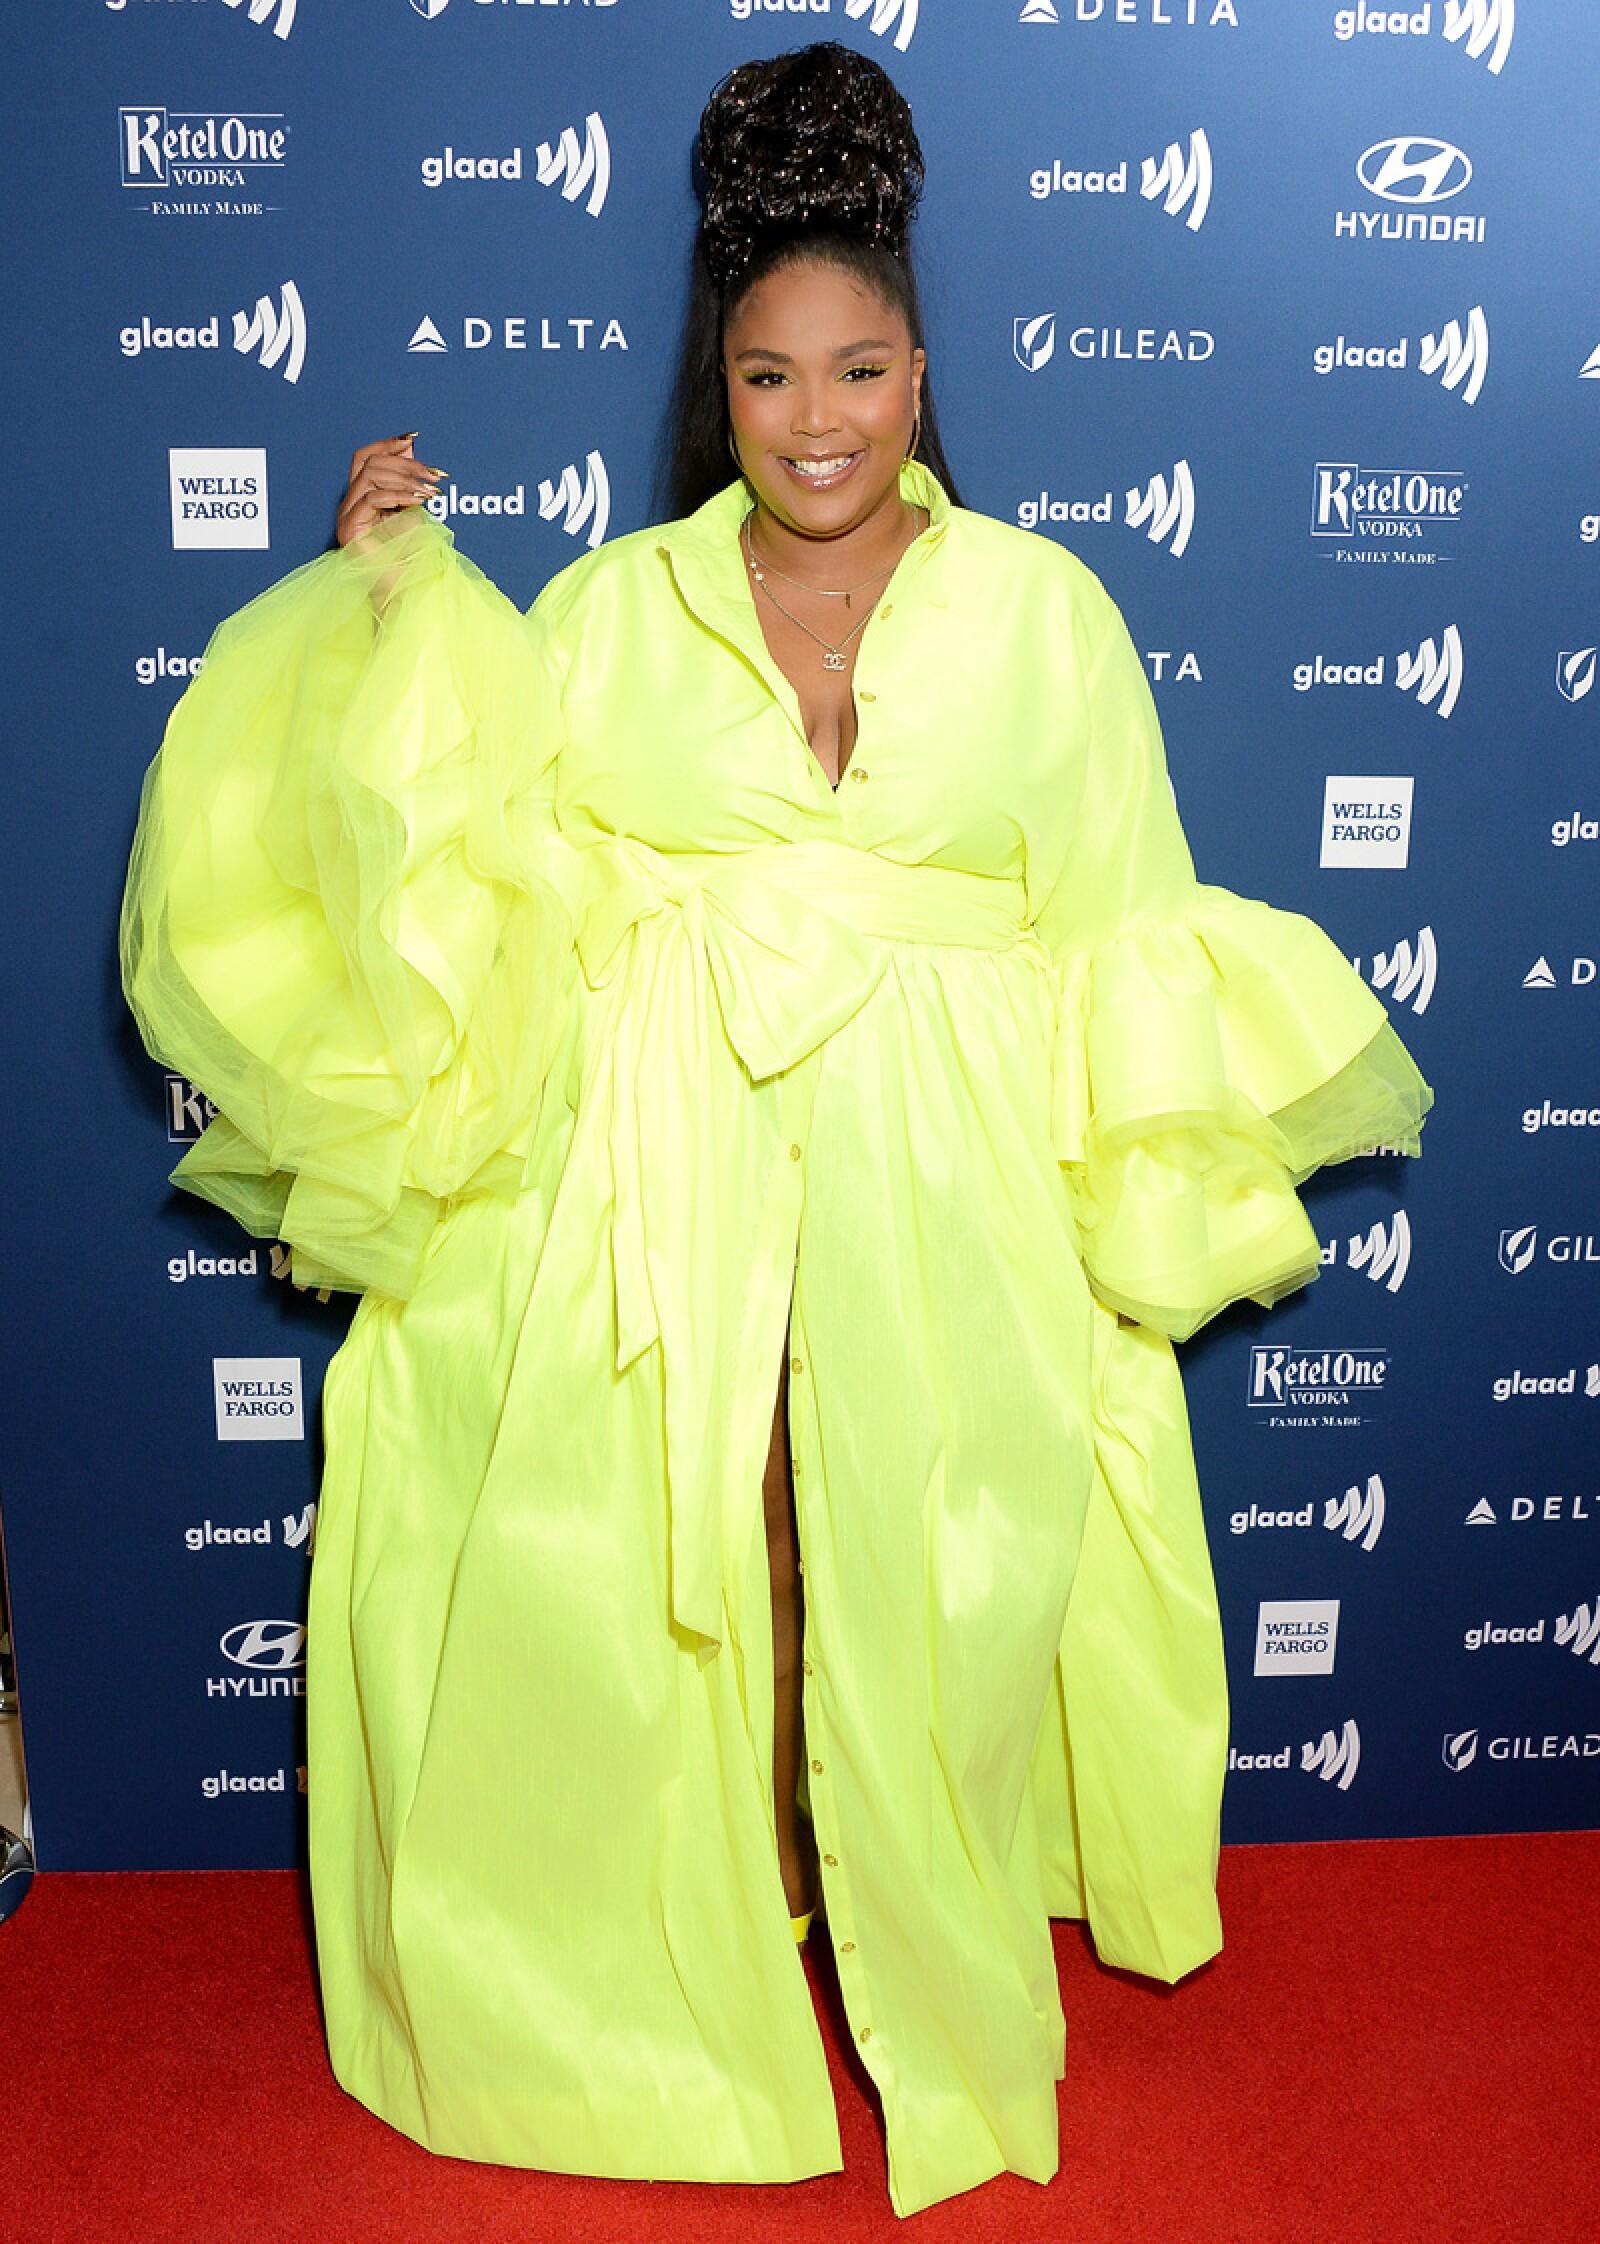 30th Annual GLAAD Media Awards, Arrivals, Los Angeles, USA - 28 Mar 2019